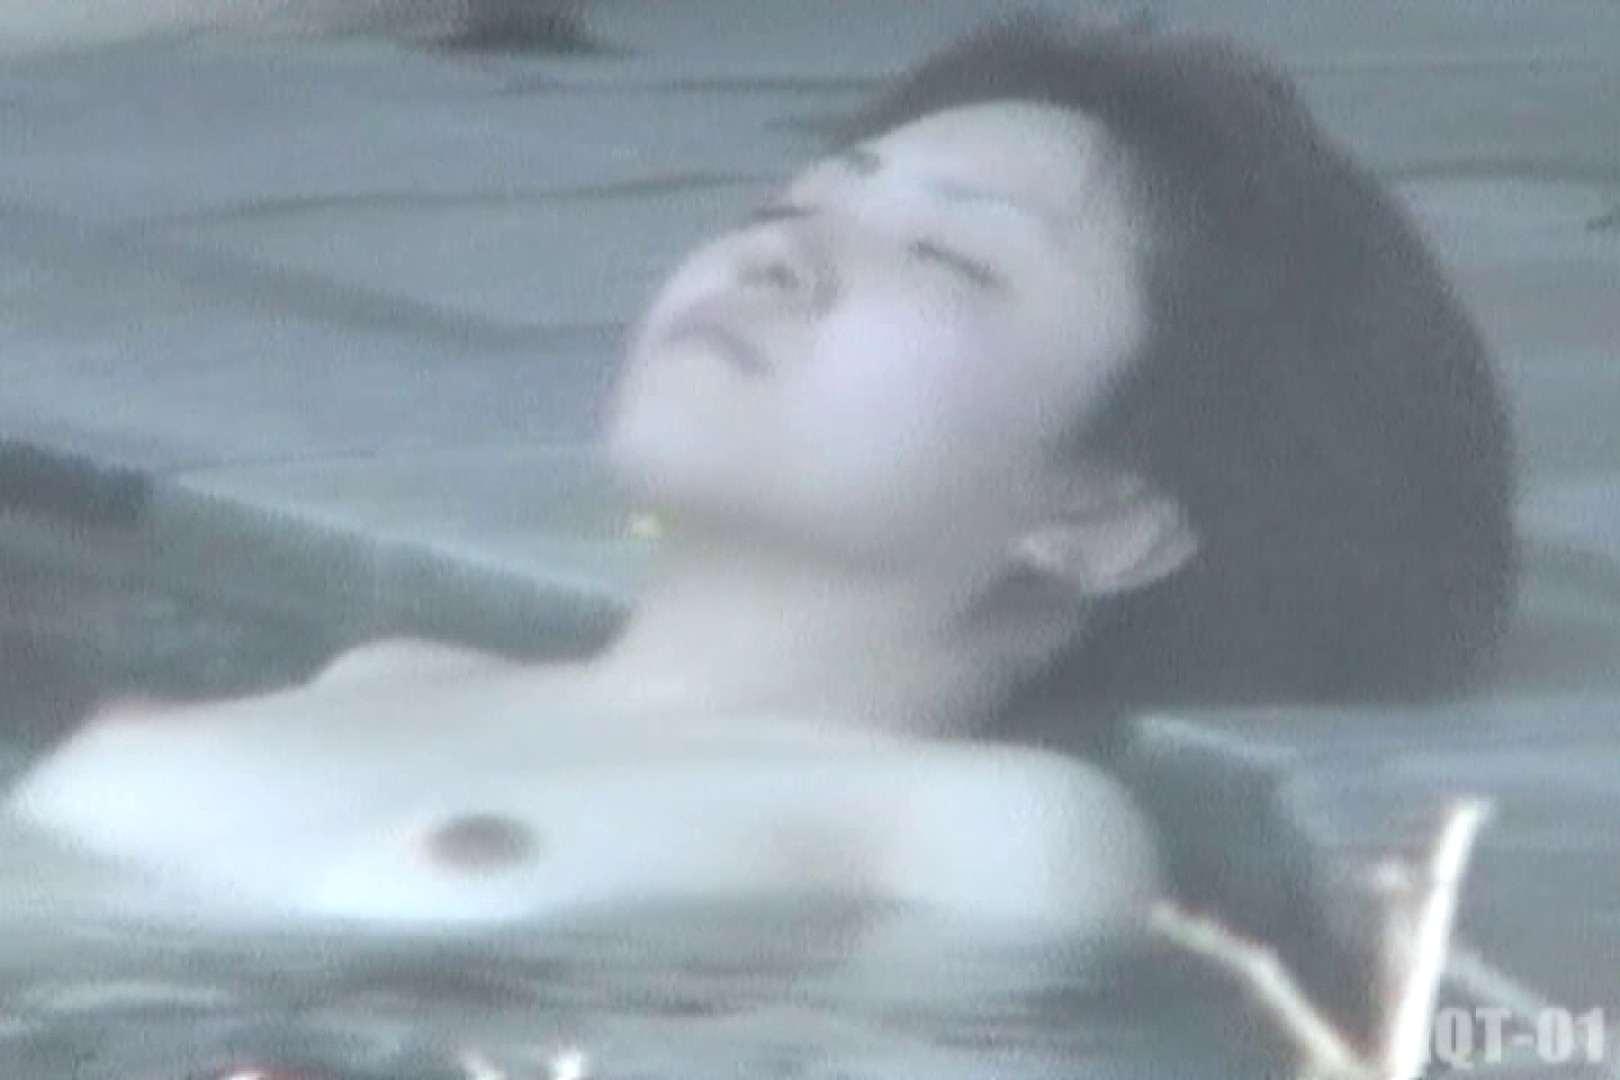 Aquaな露天風呂Vol.720 エロいOL われめAV動画紹介 26枚